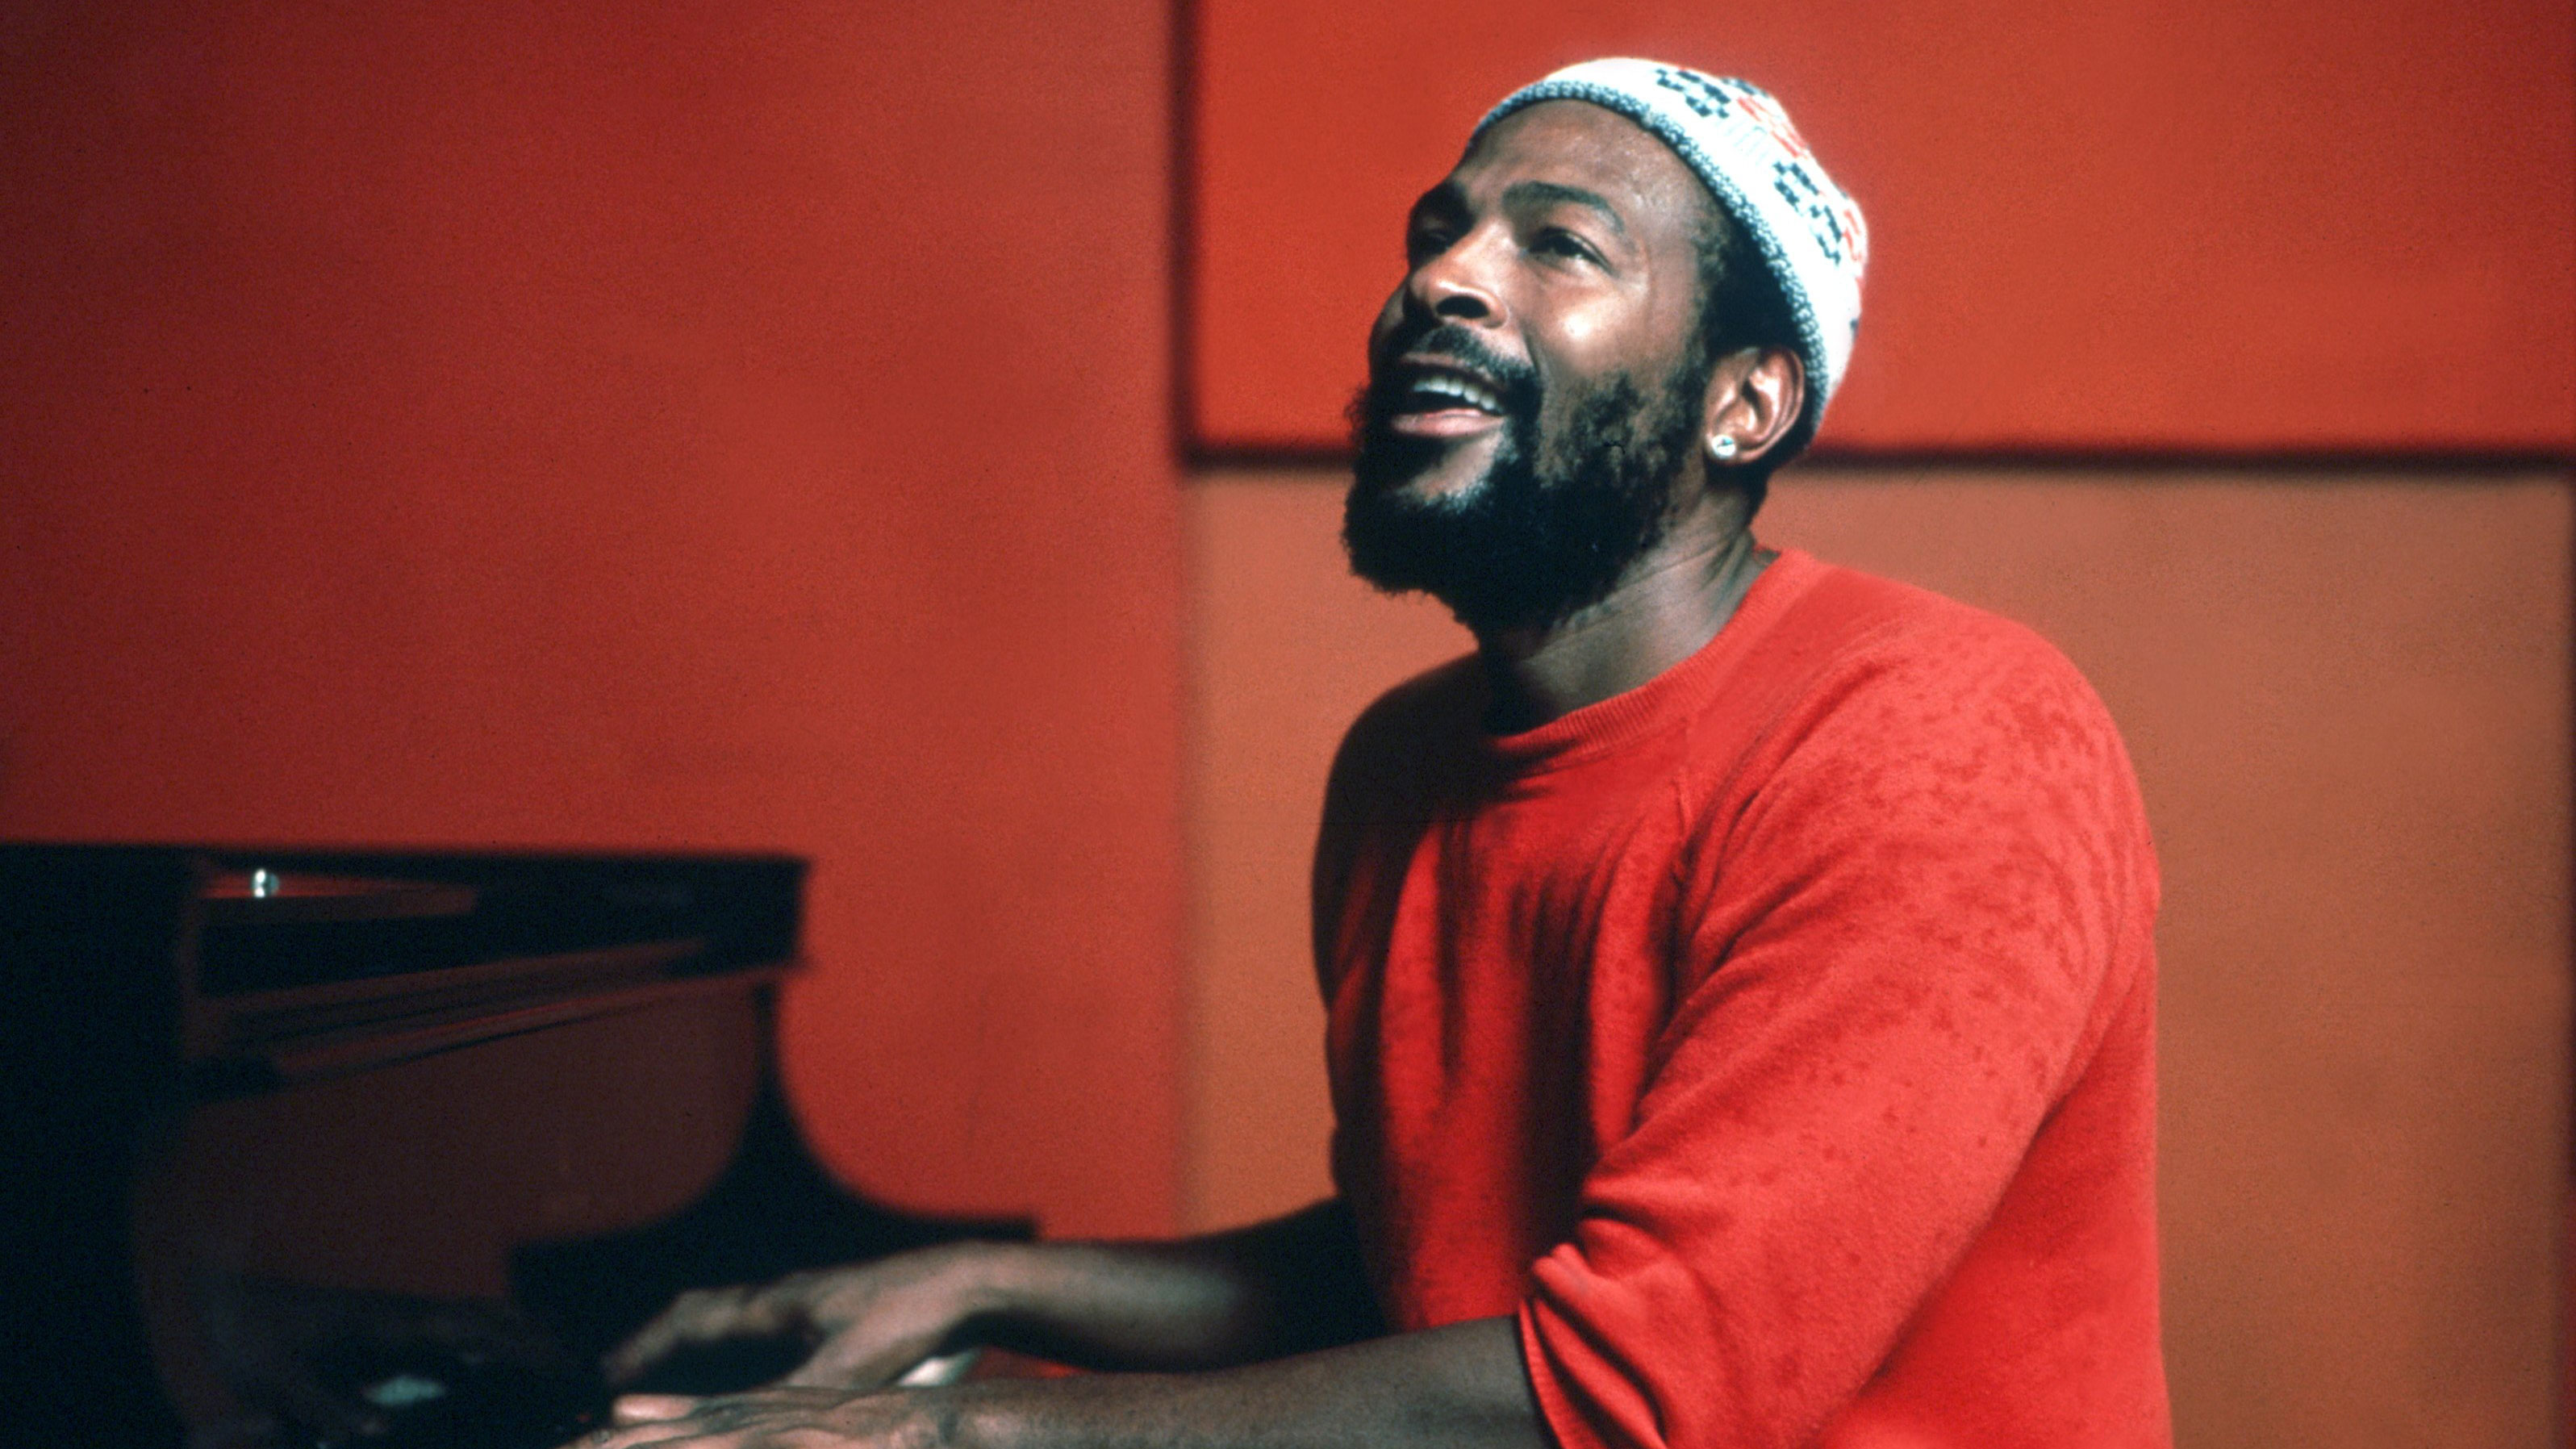 Soul Singer Playing Piano